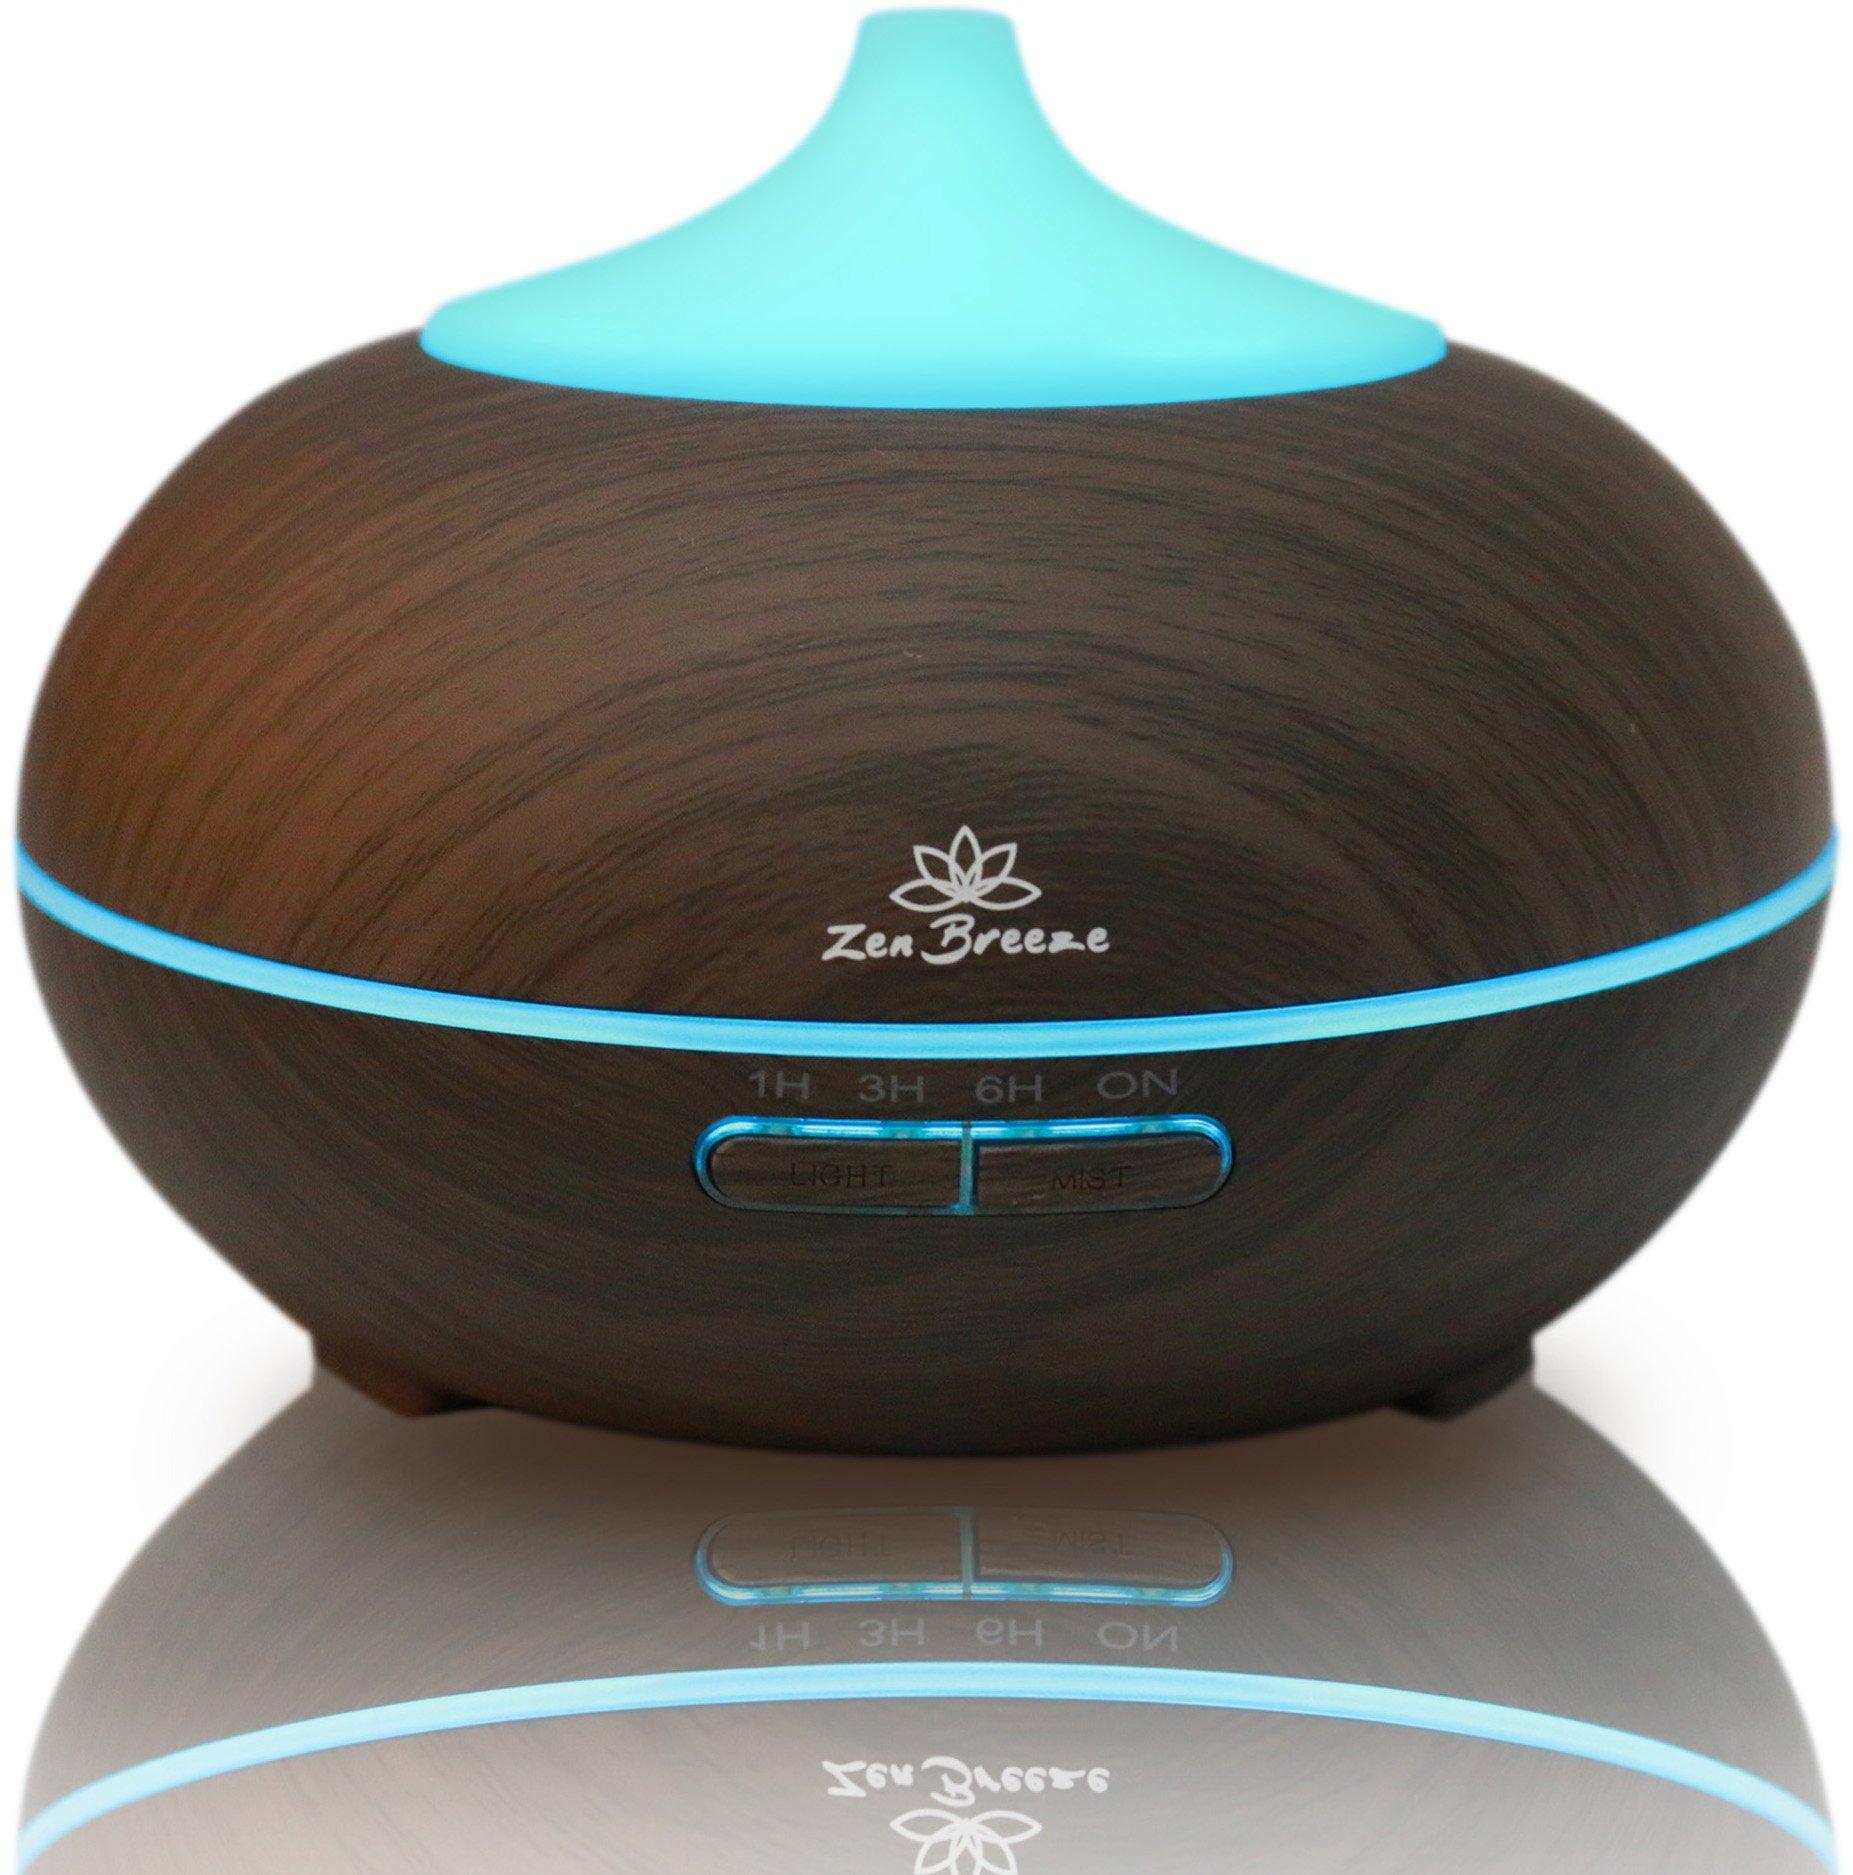 Zen Breeze Essential Oil Diffuser Dark Wood - Aromatherapy Diffuser - Birthday Gift Edition by Zen Breeze